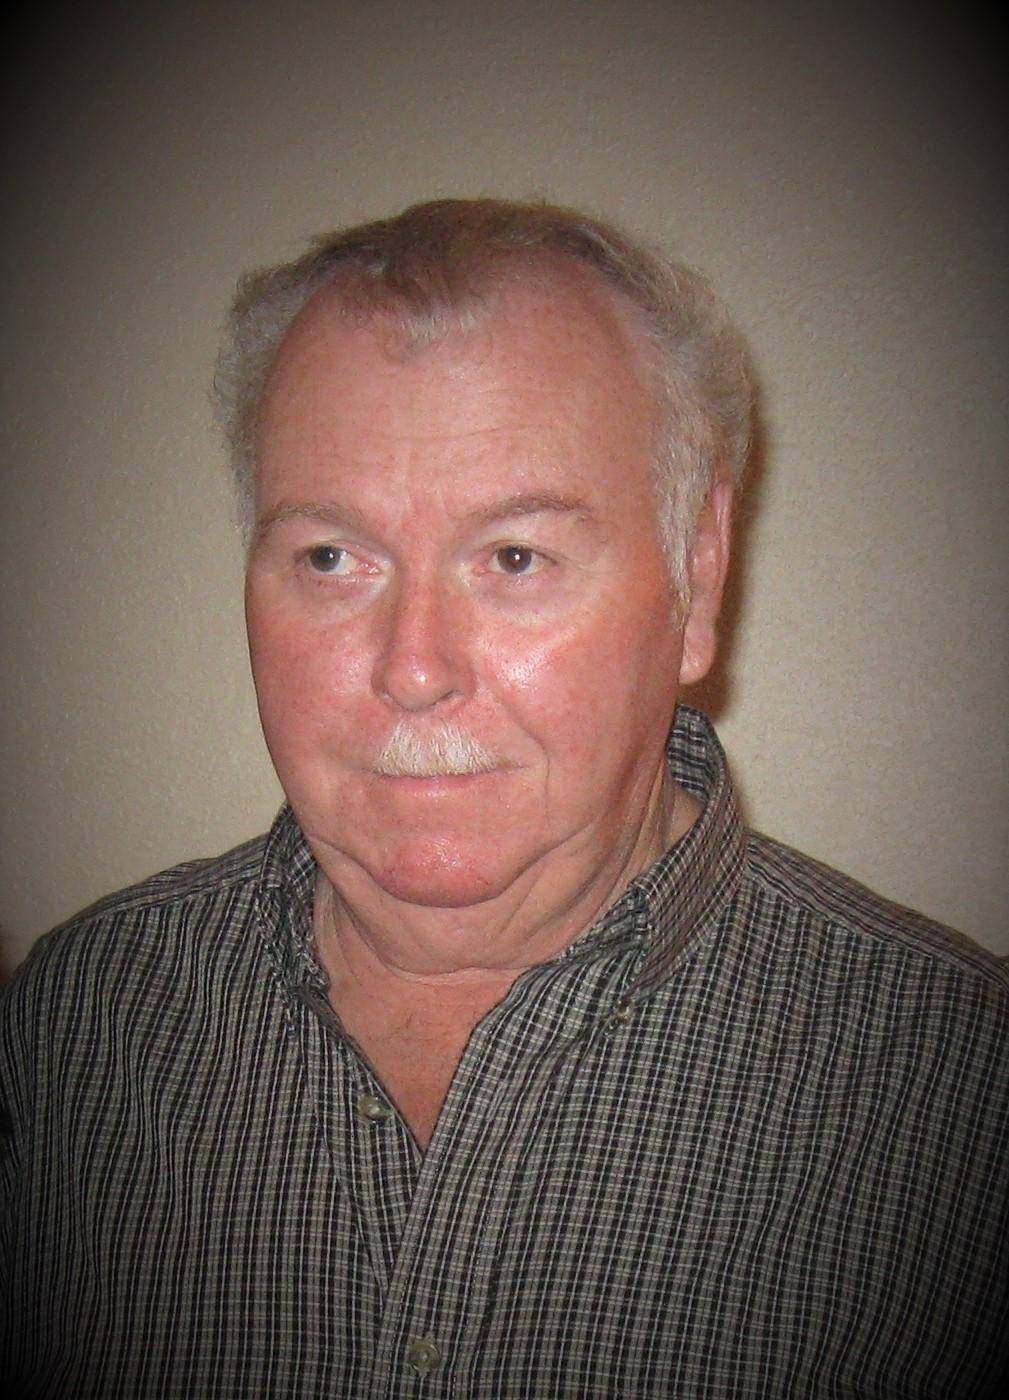 Barry Chiasson